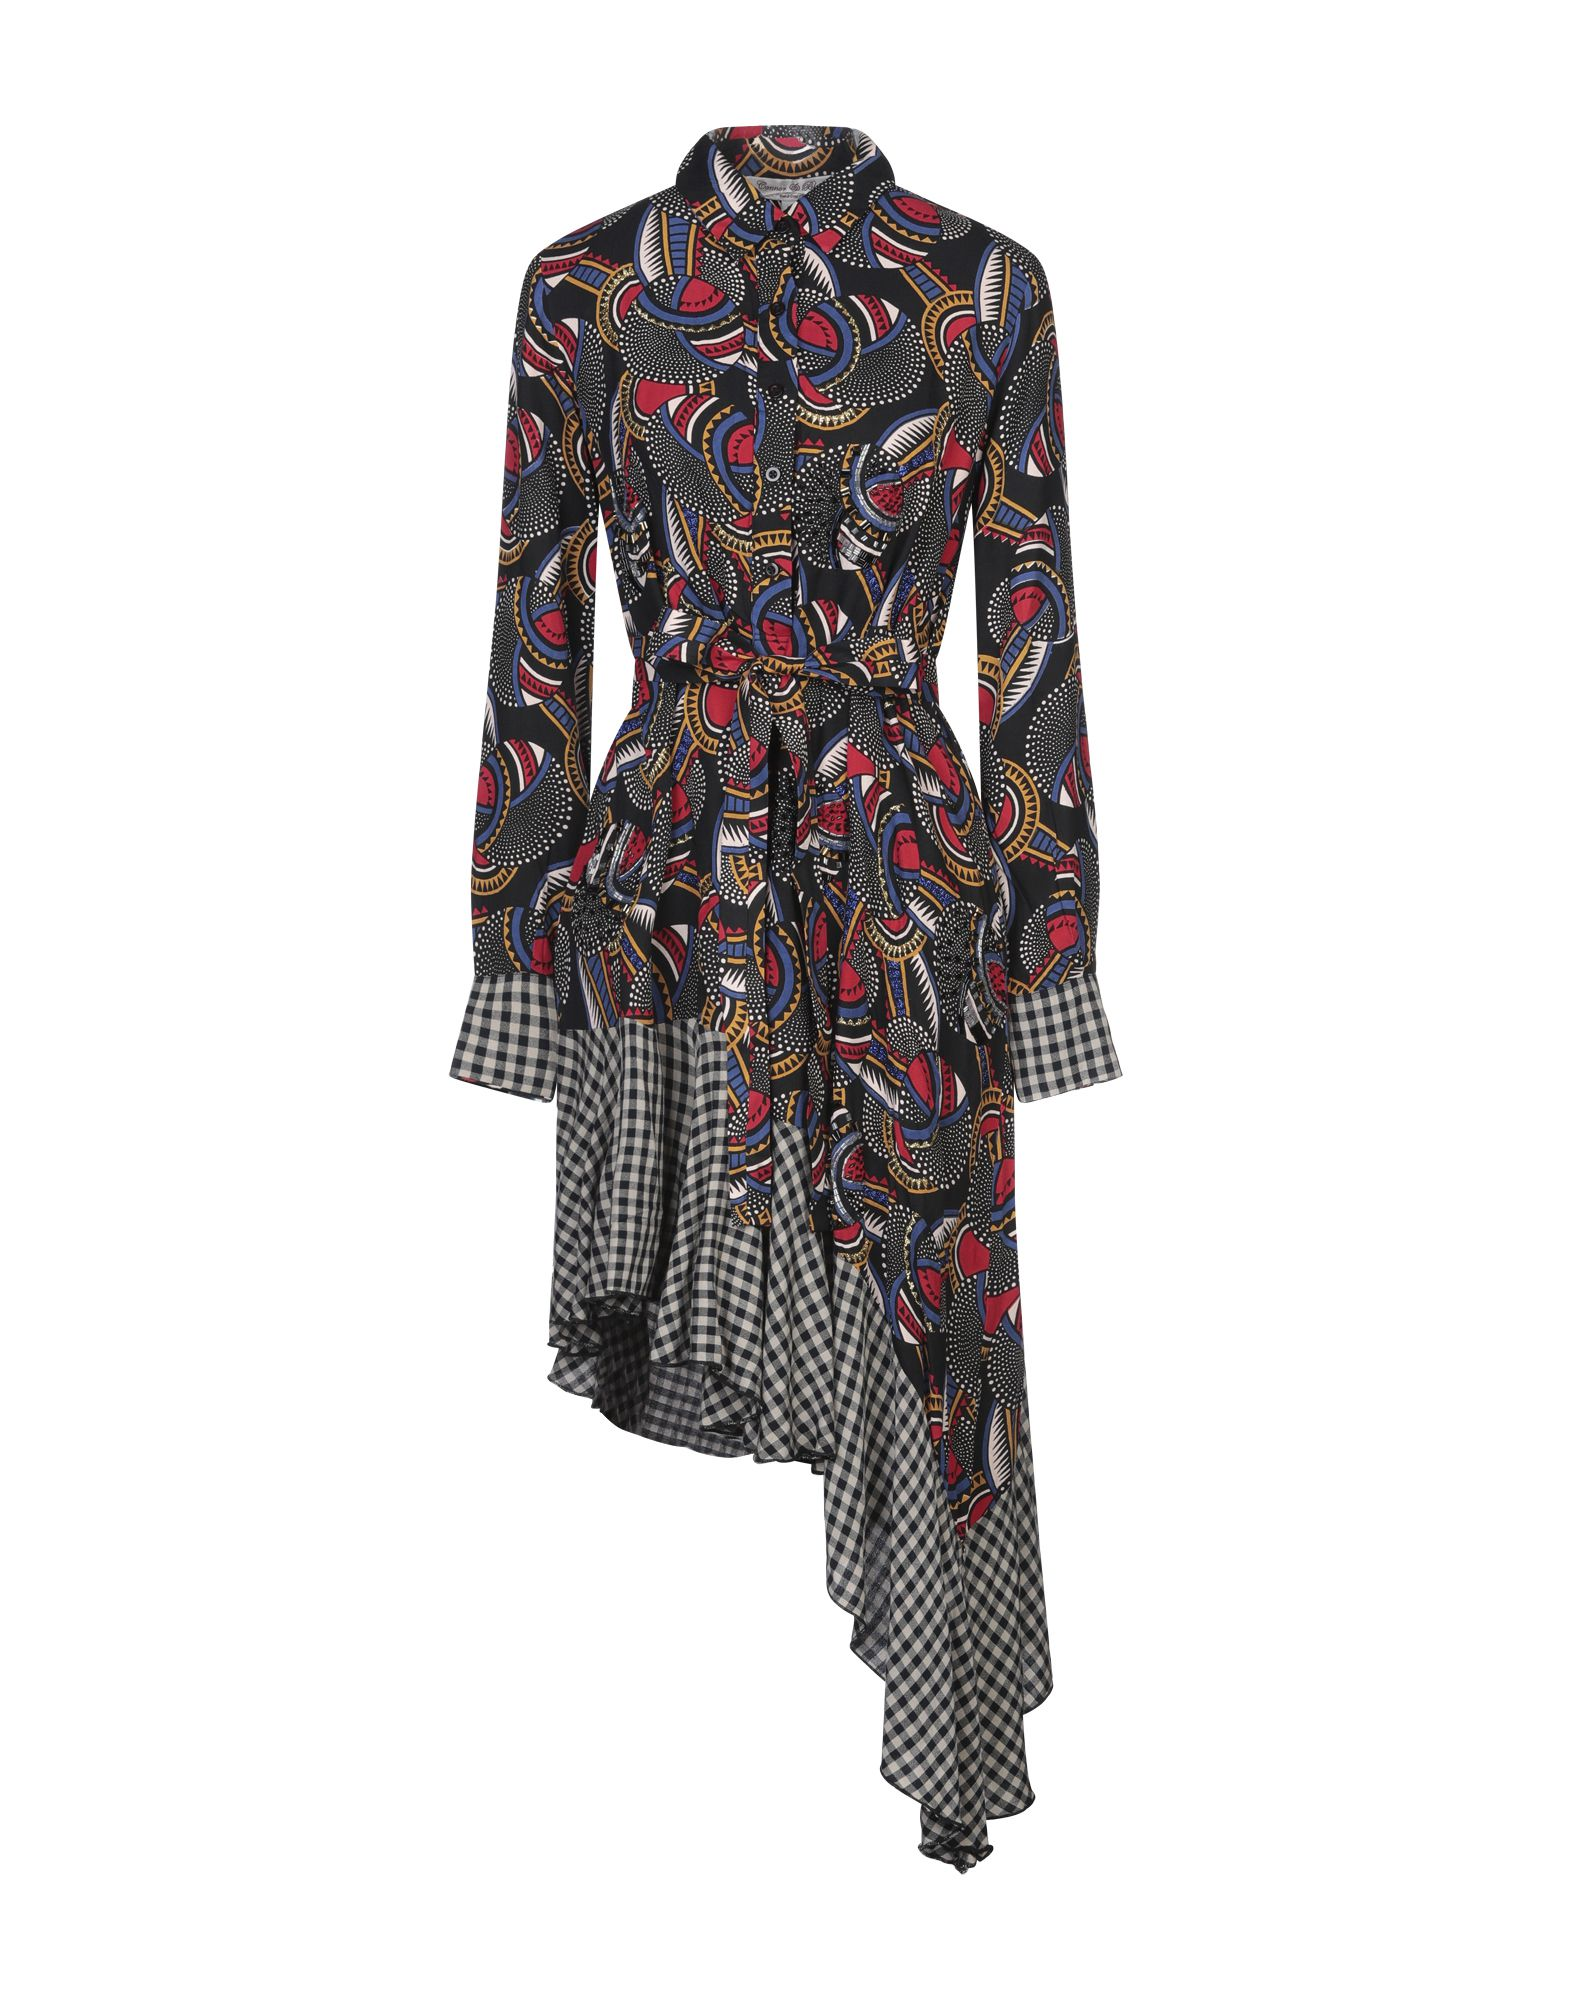 CONNOR & BLAKE Короткое платье